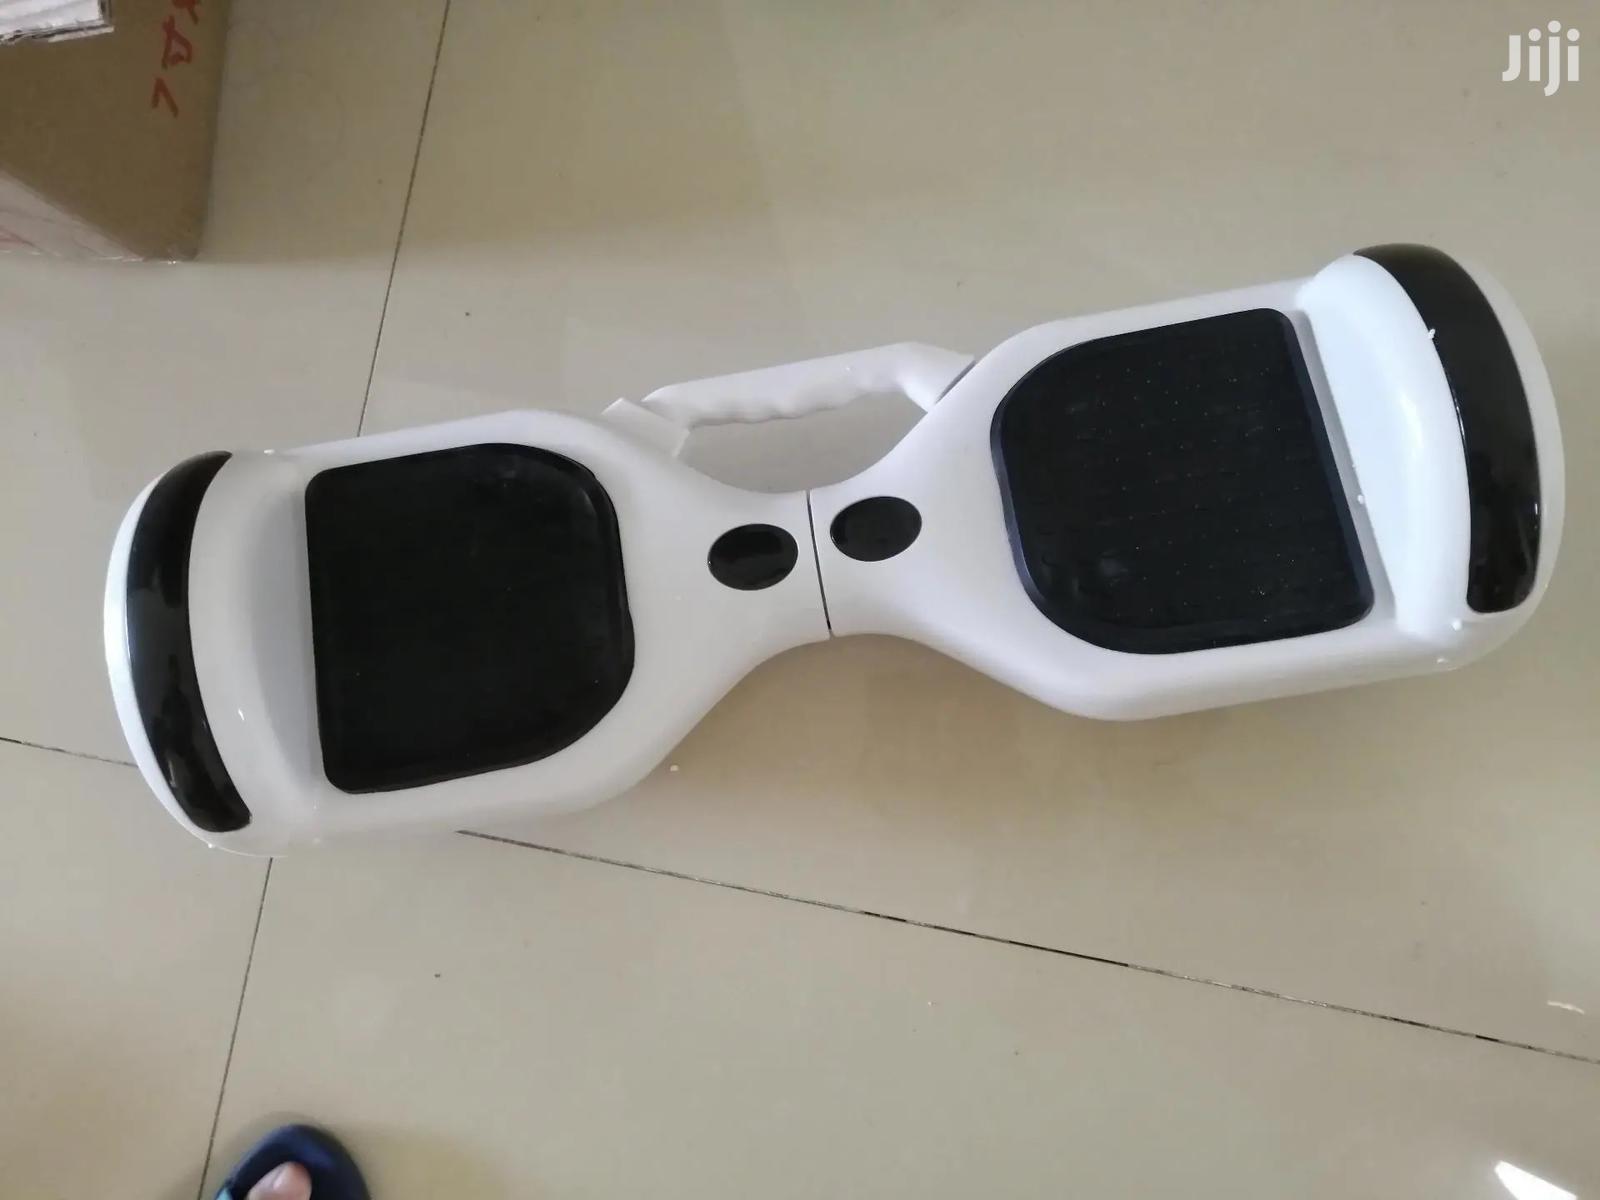 Scooter Hover Board | Sports Equipment for sale in Kampala, Central Region, Uganda